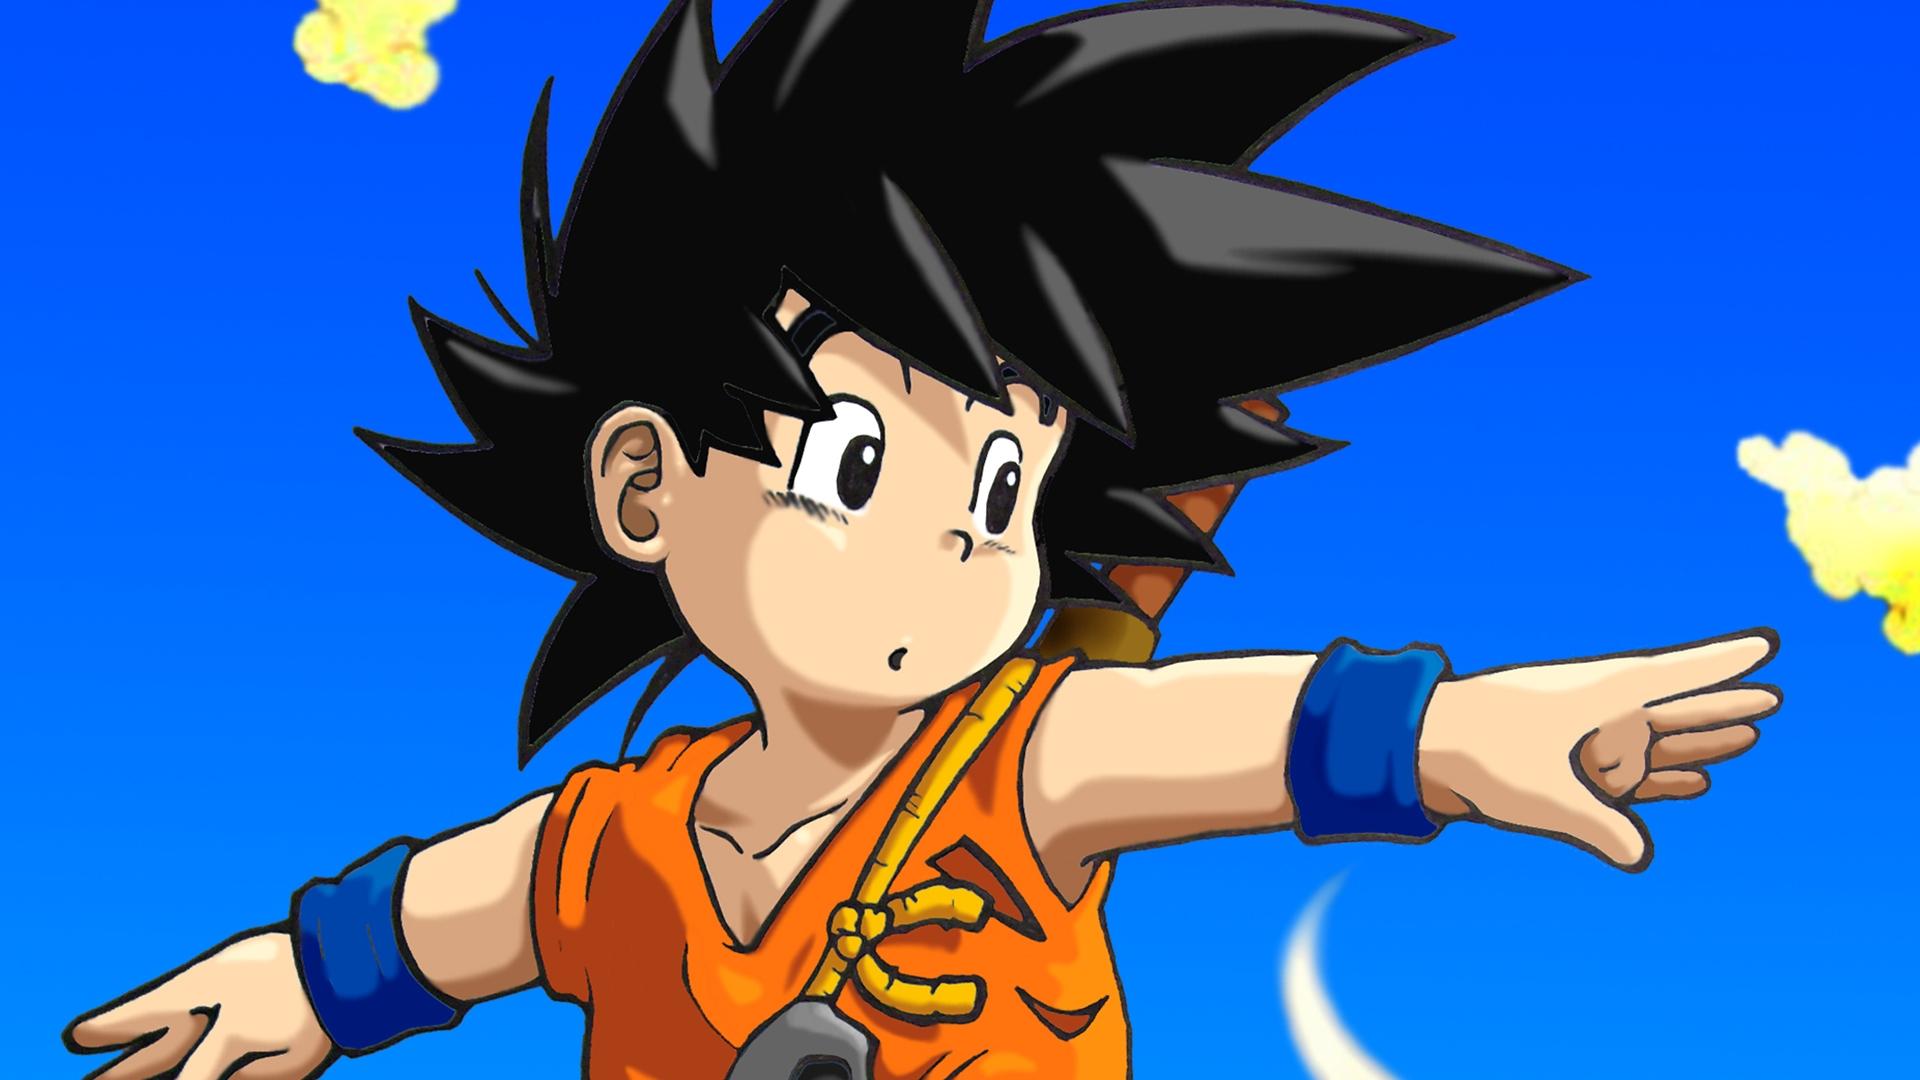 Son Goku wallpaper 1920x1080